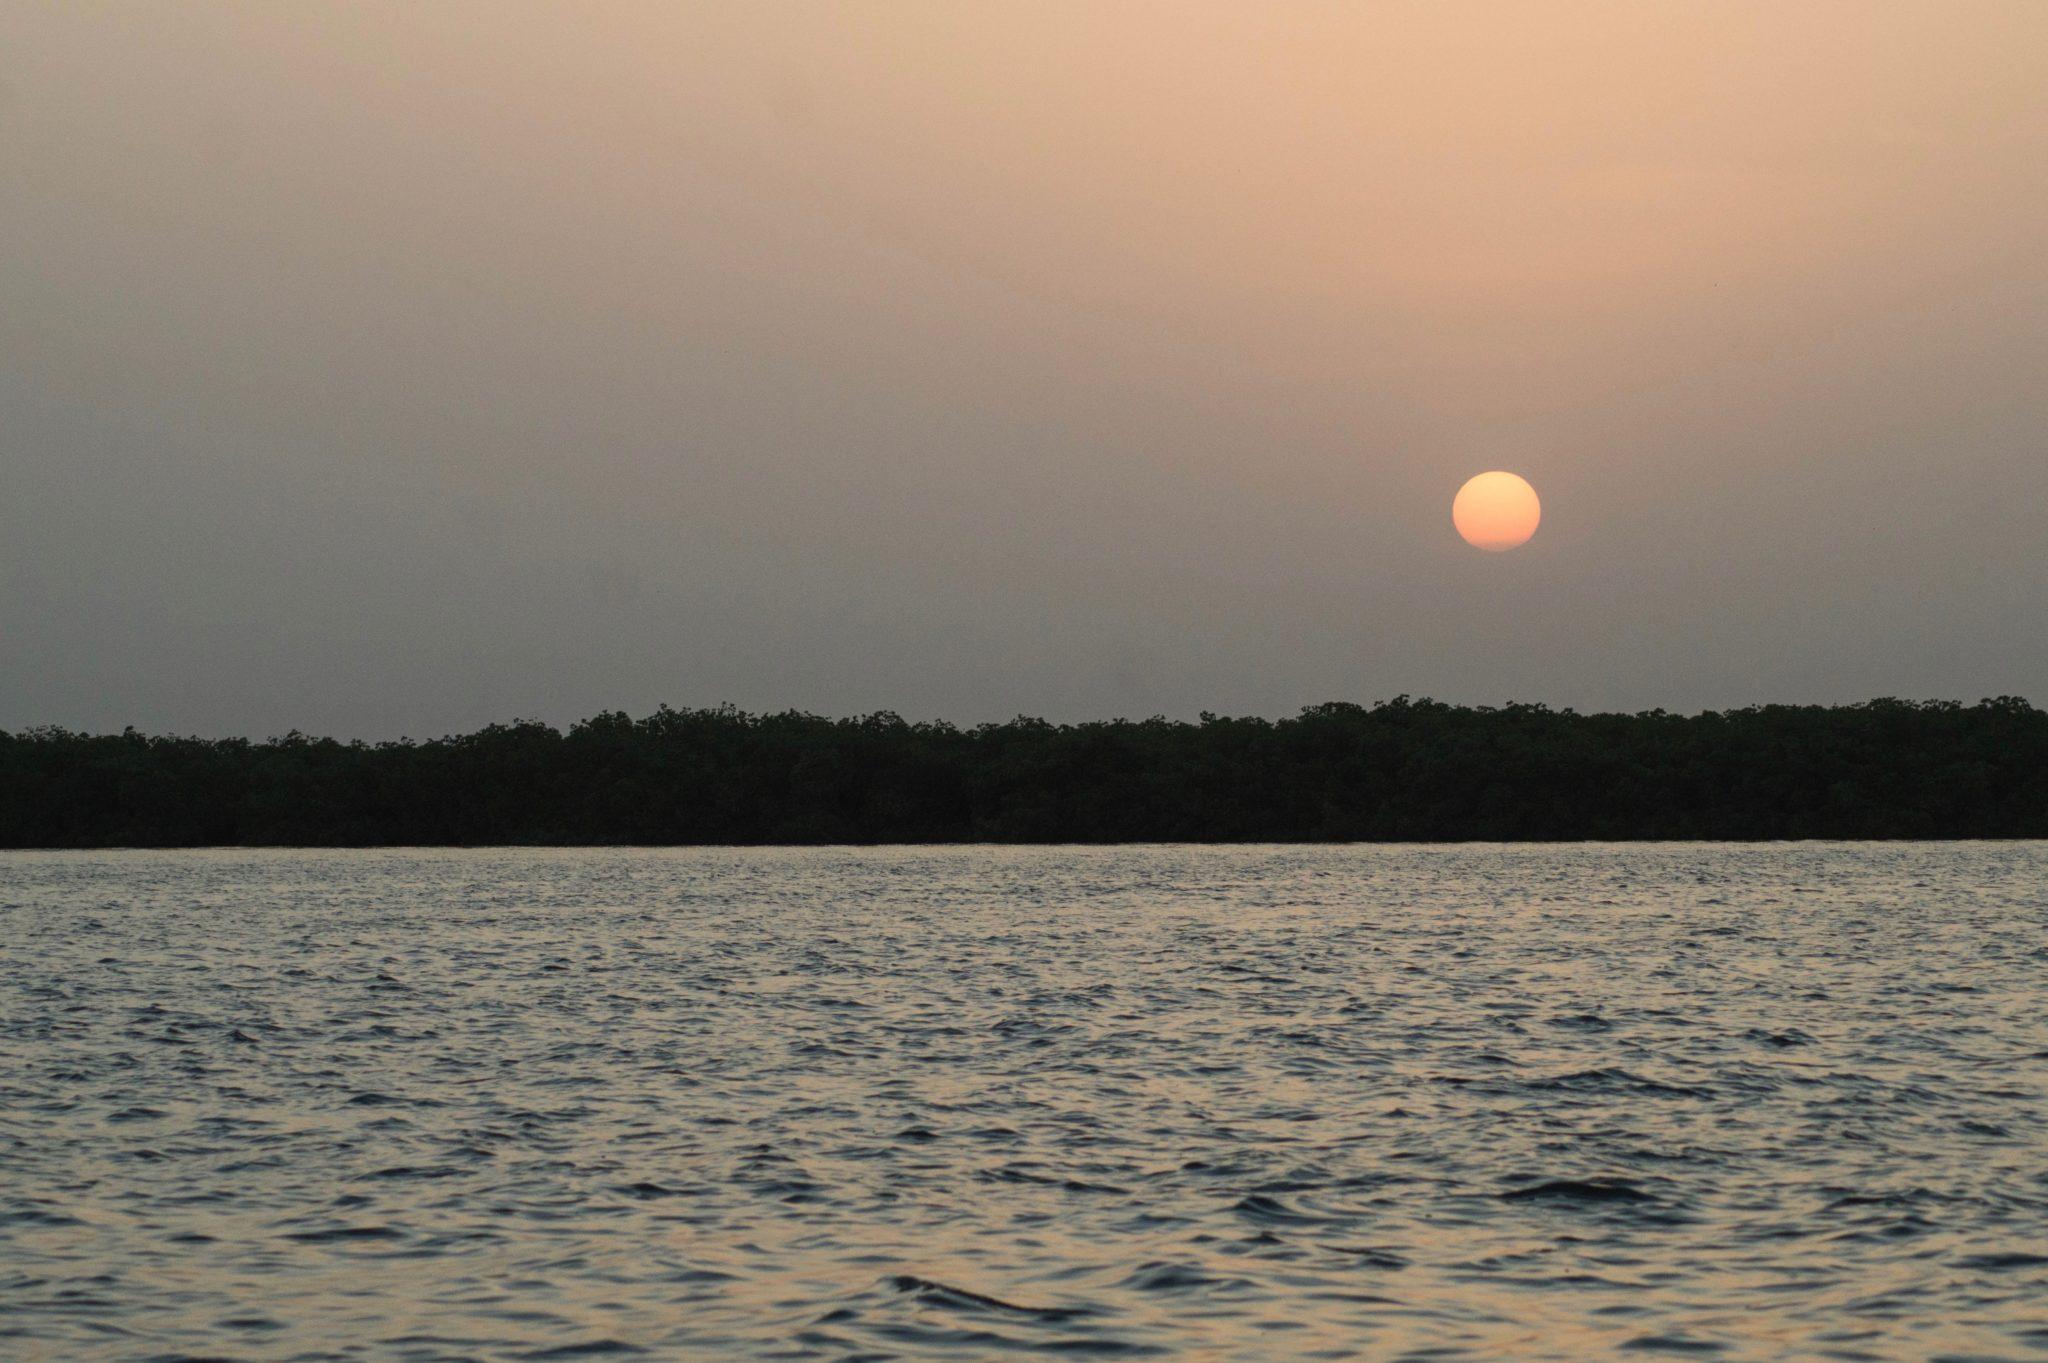 Sonneuntergang im Sine Saloum Senegal: Ein magischer Moment